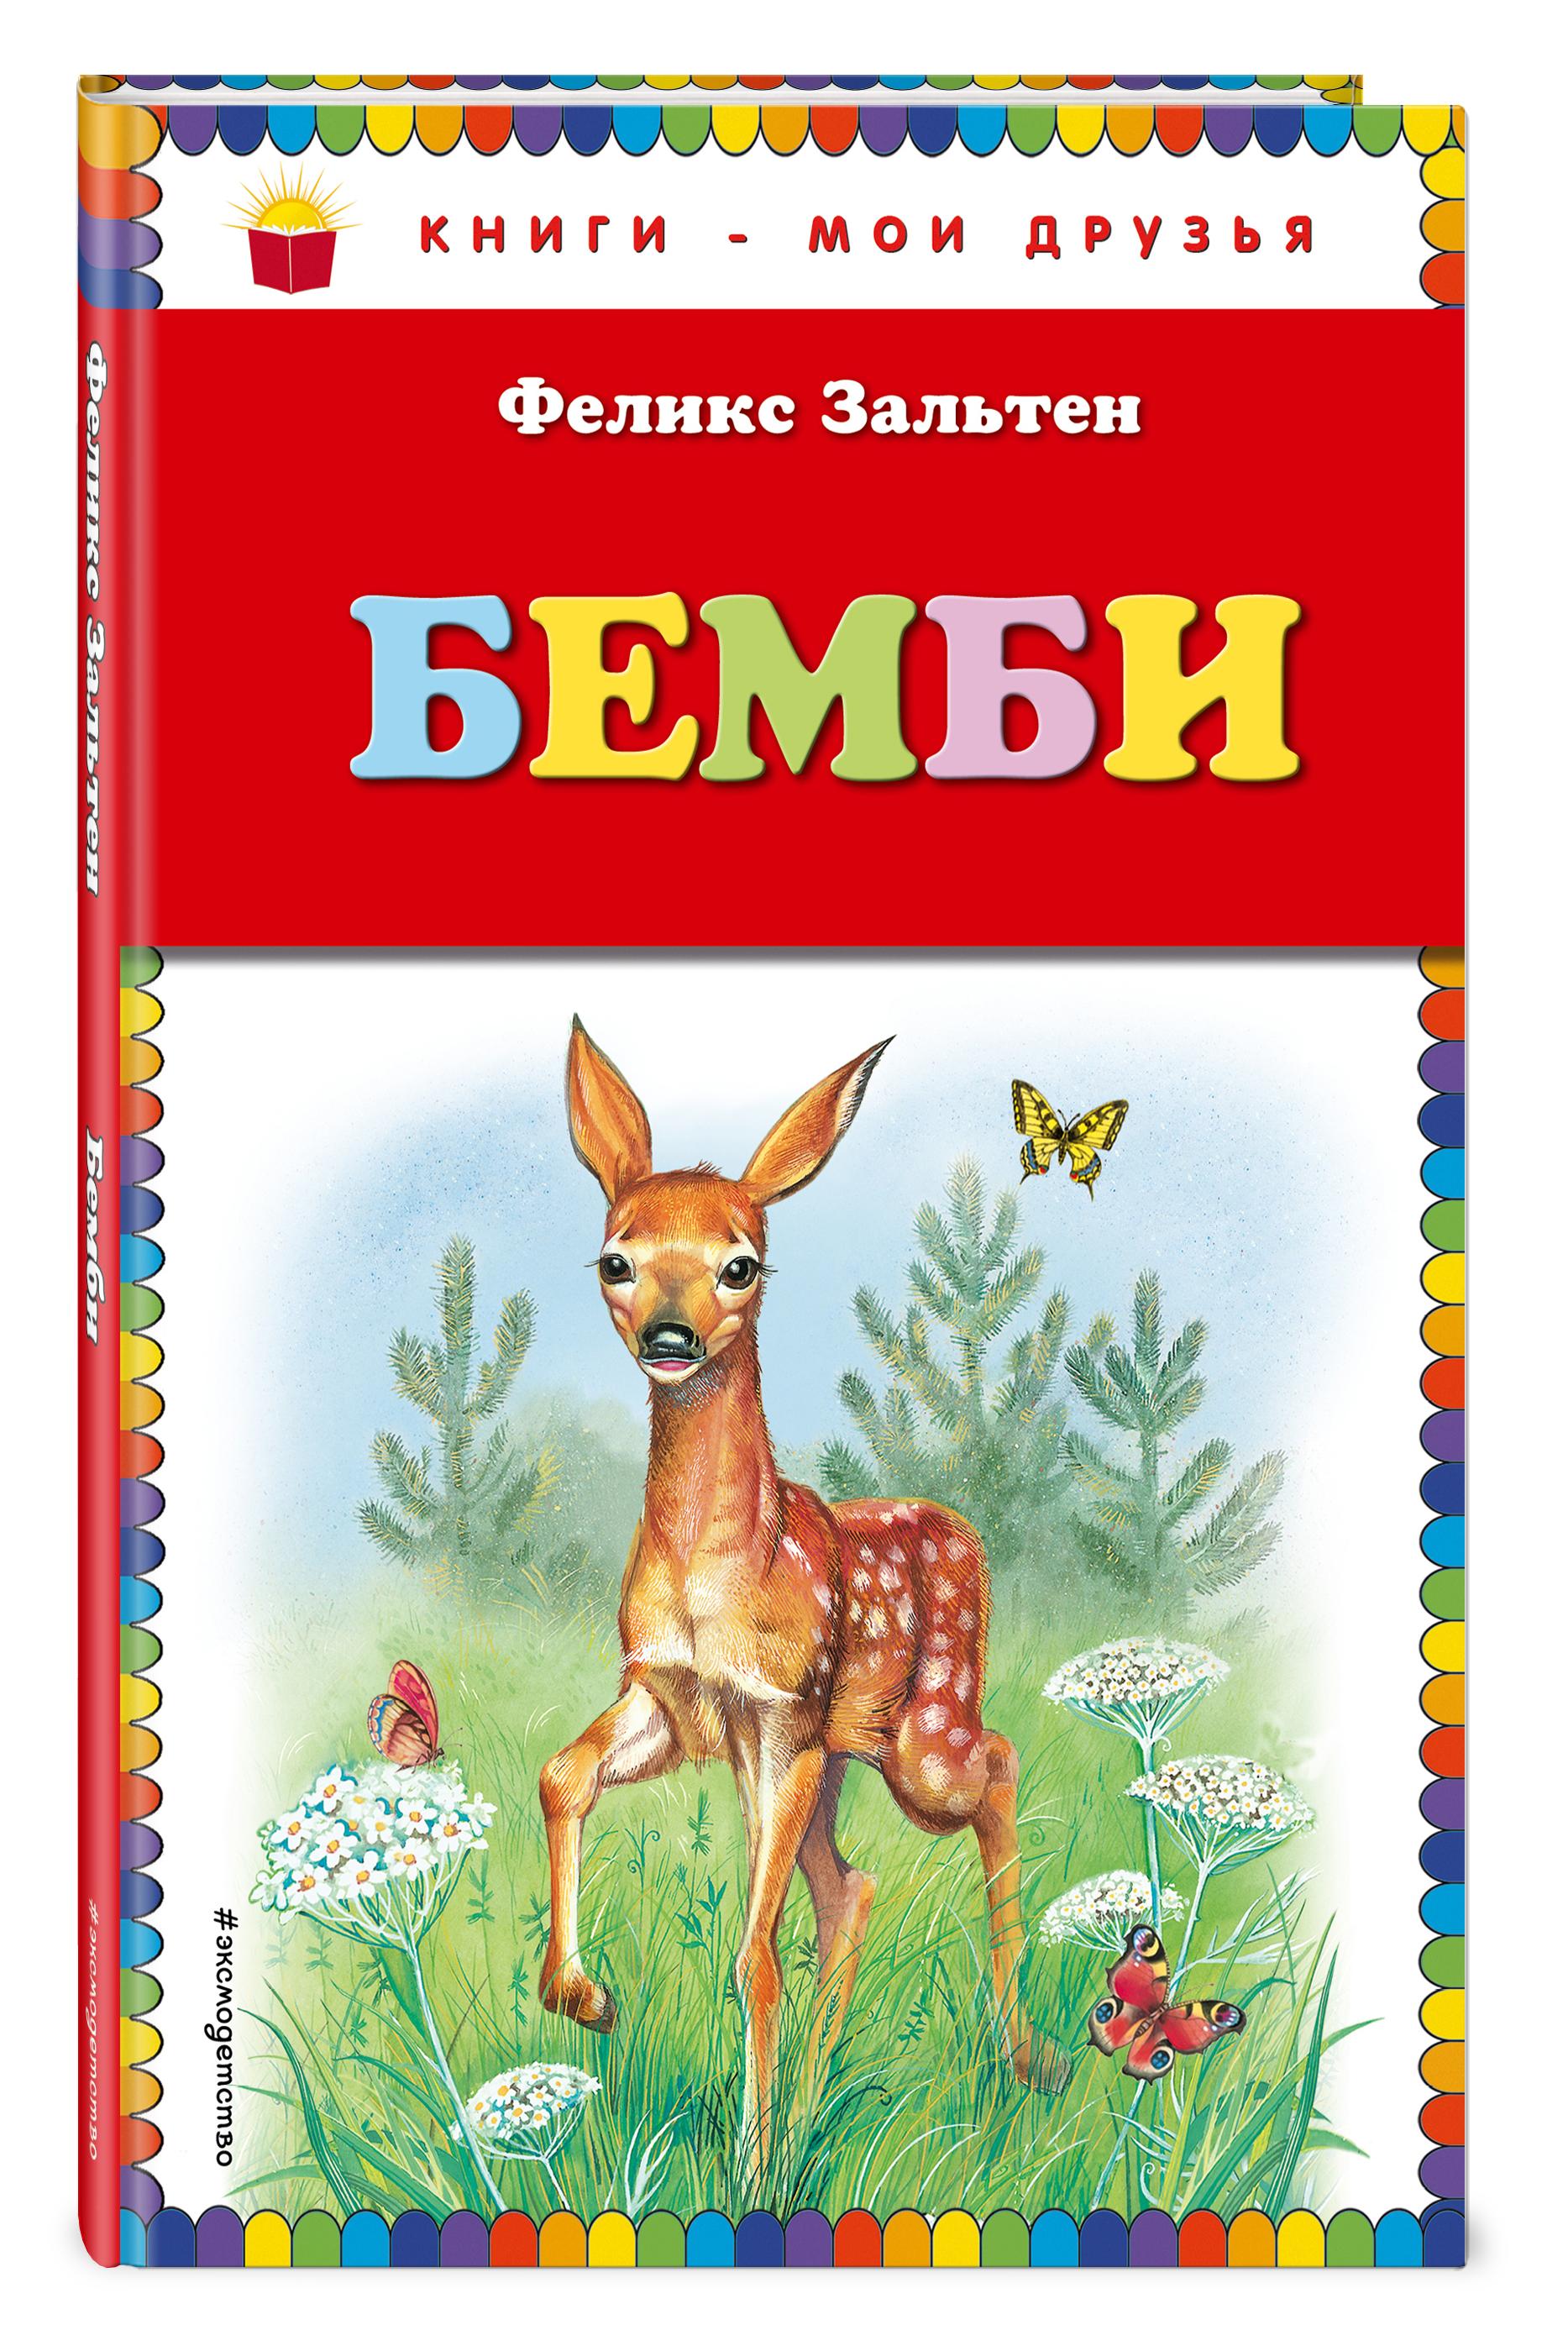 Феликс Зальтен Бемби (ил. М. Митрофанова)